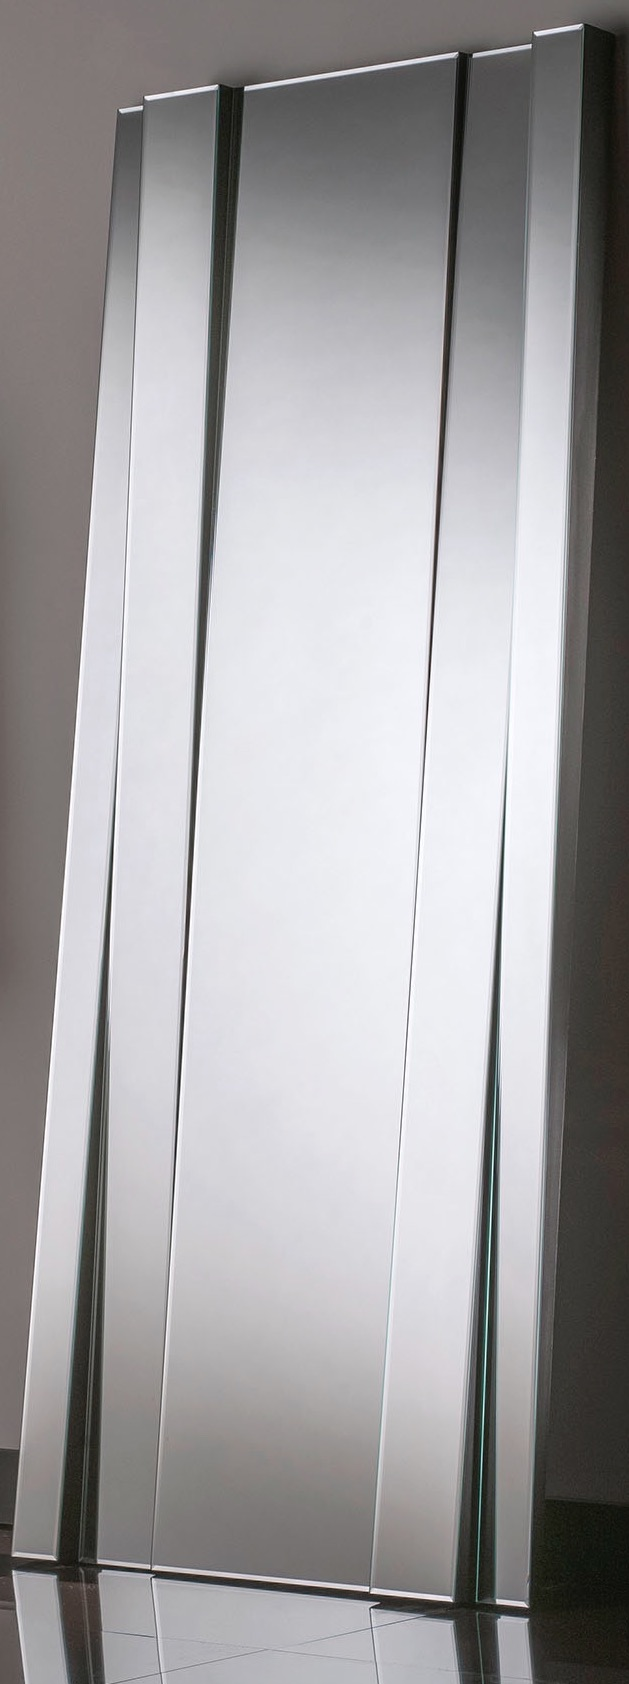 UK hand made - Silver Modern Bevelled MIrror 72